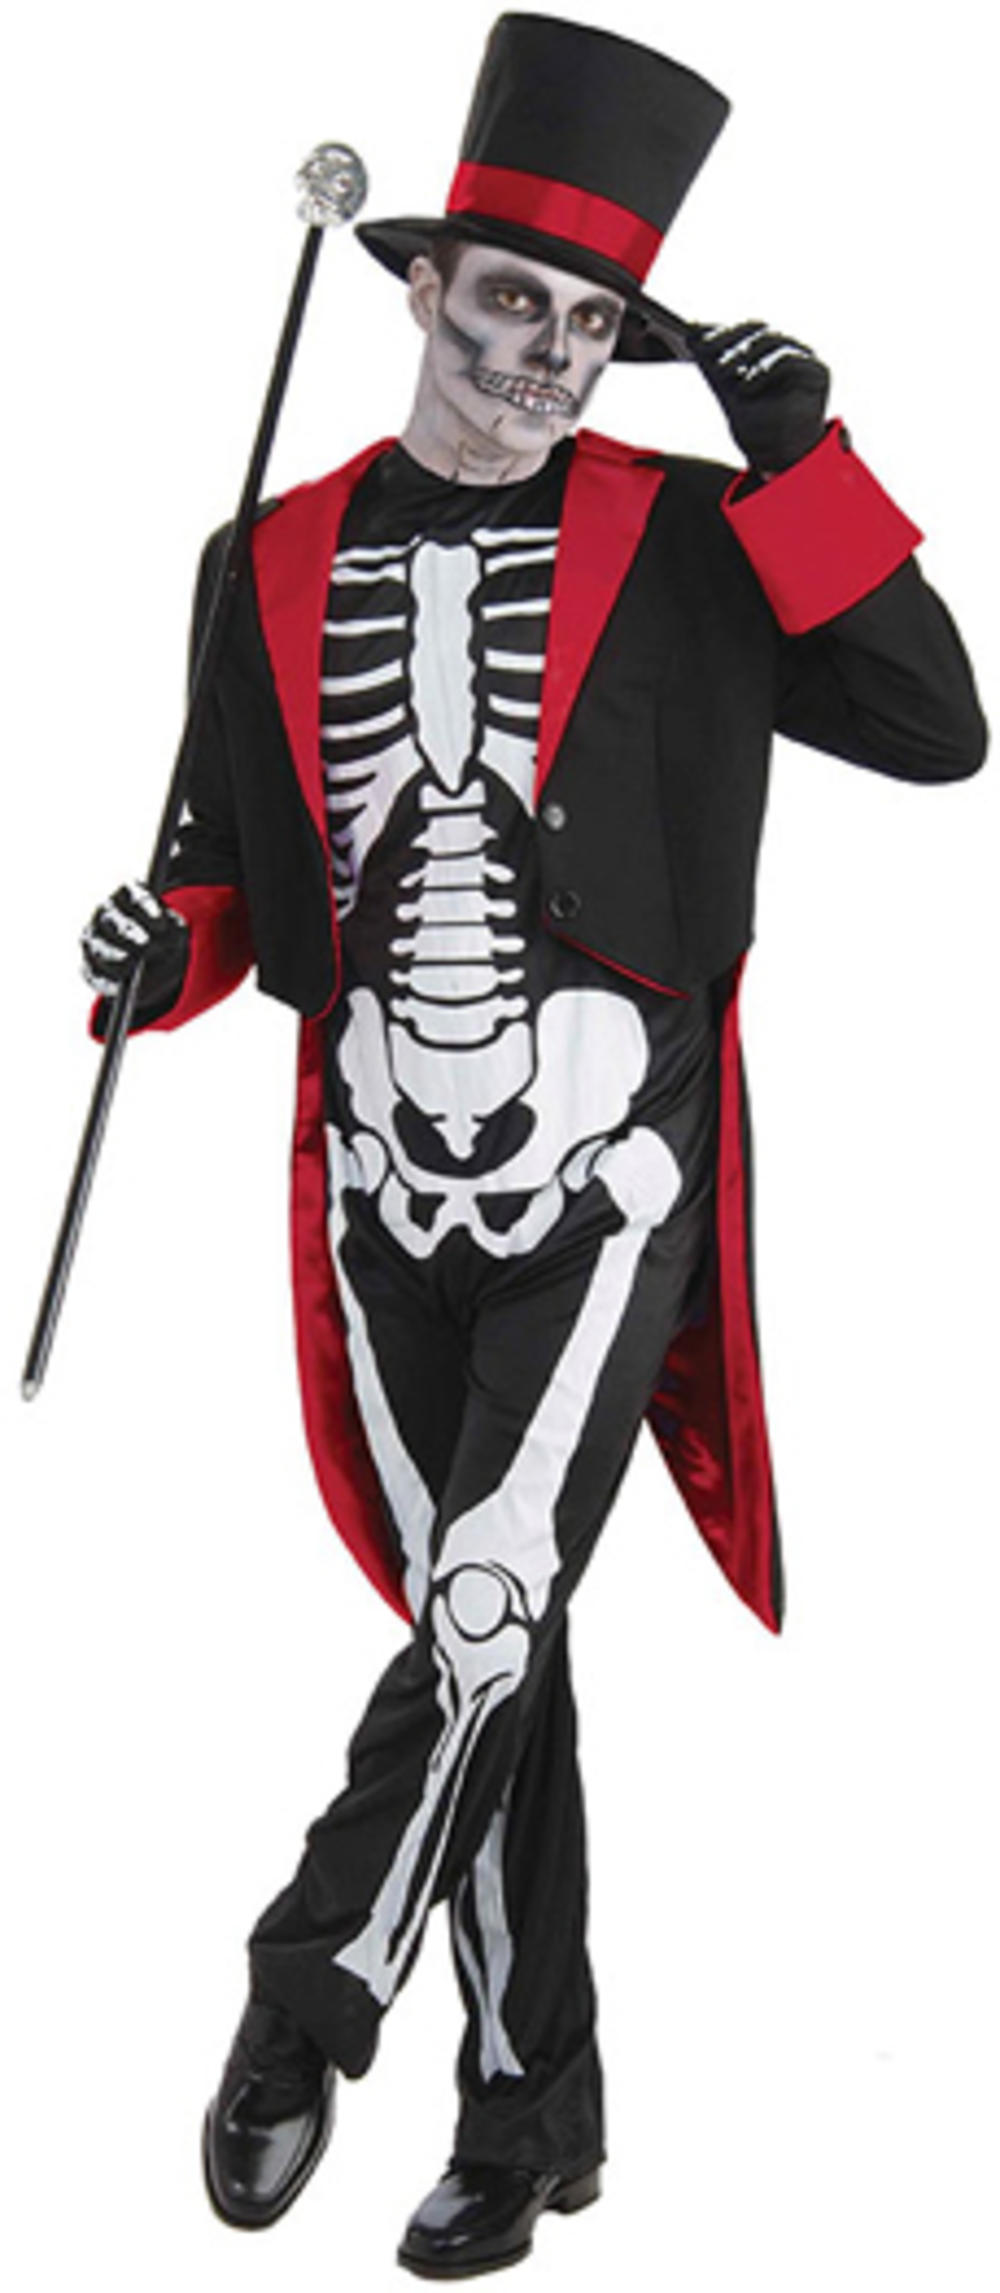 Mr Bone Jangles Skeleton Costume